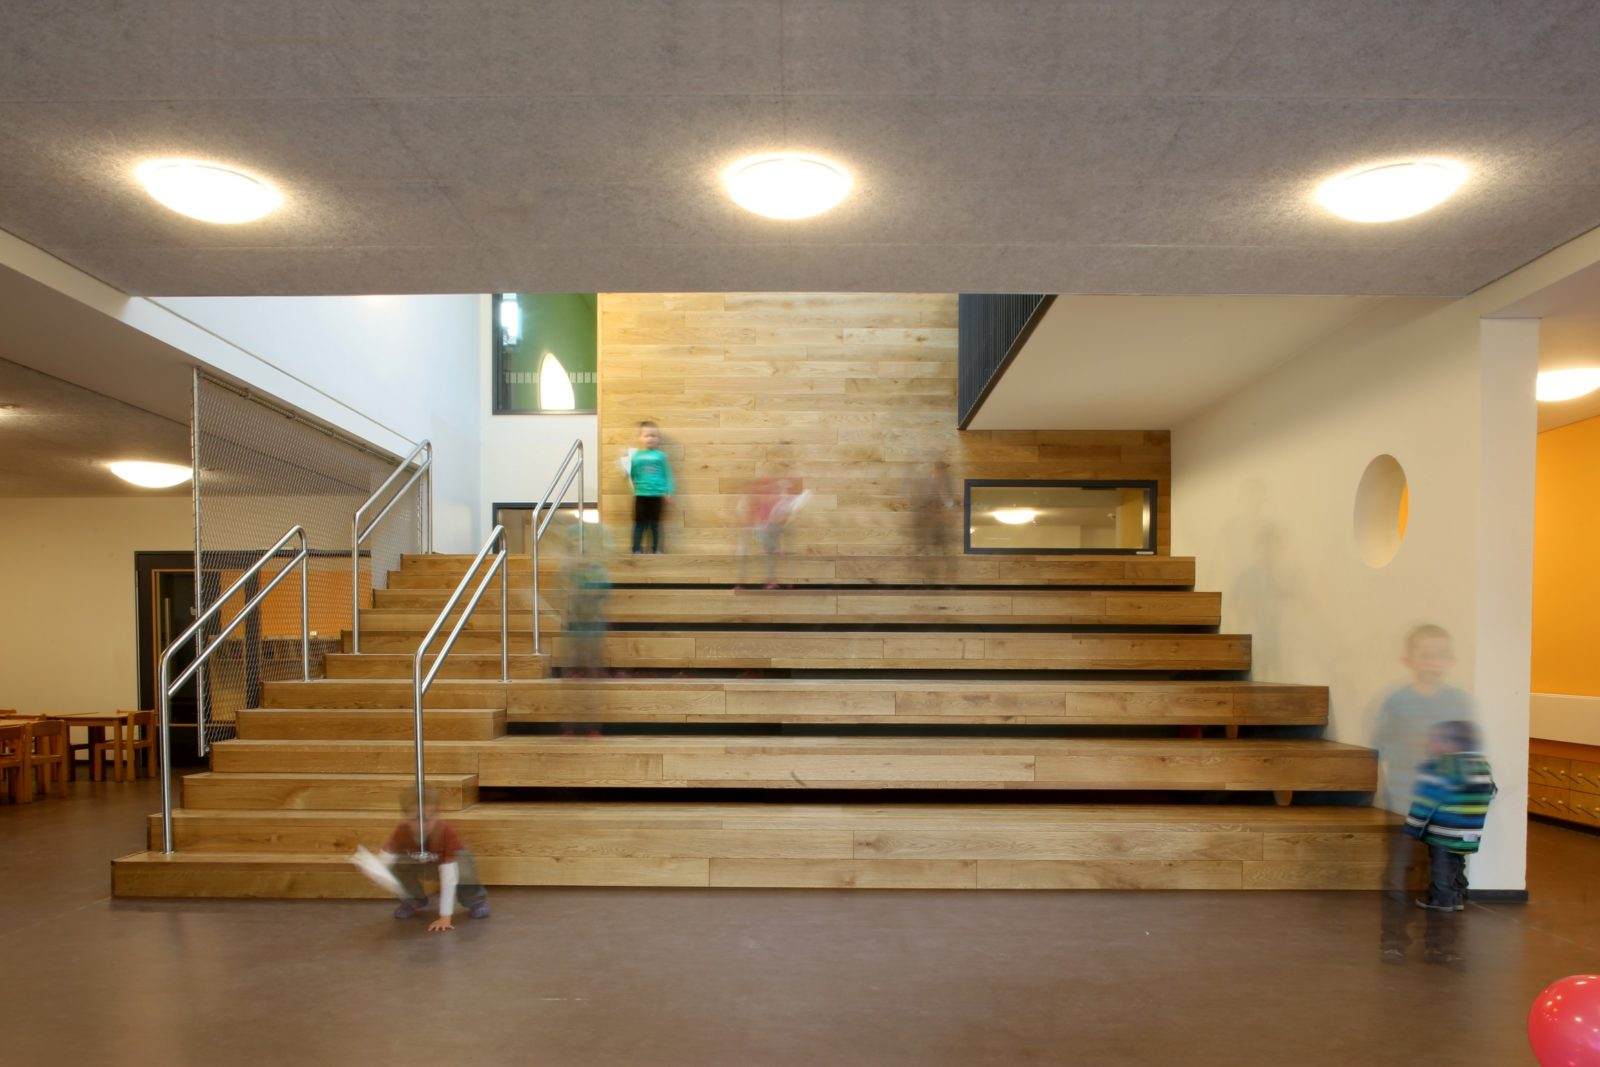 kita_Goyastrasse-Zentraltreppe